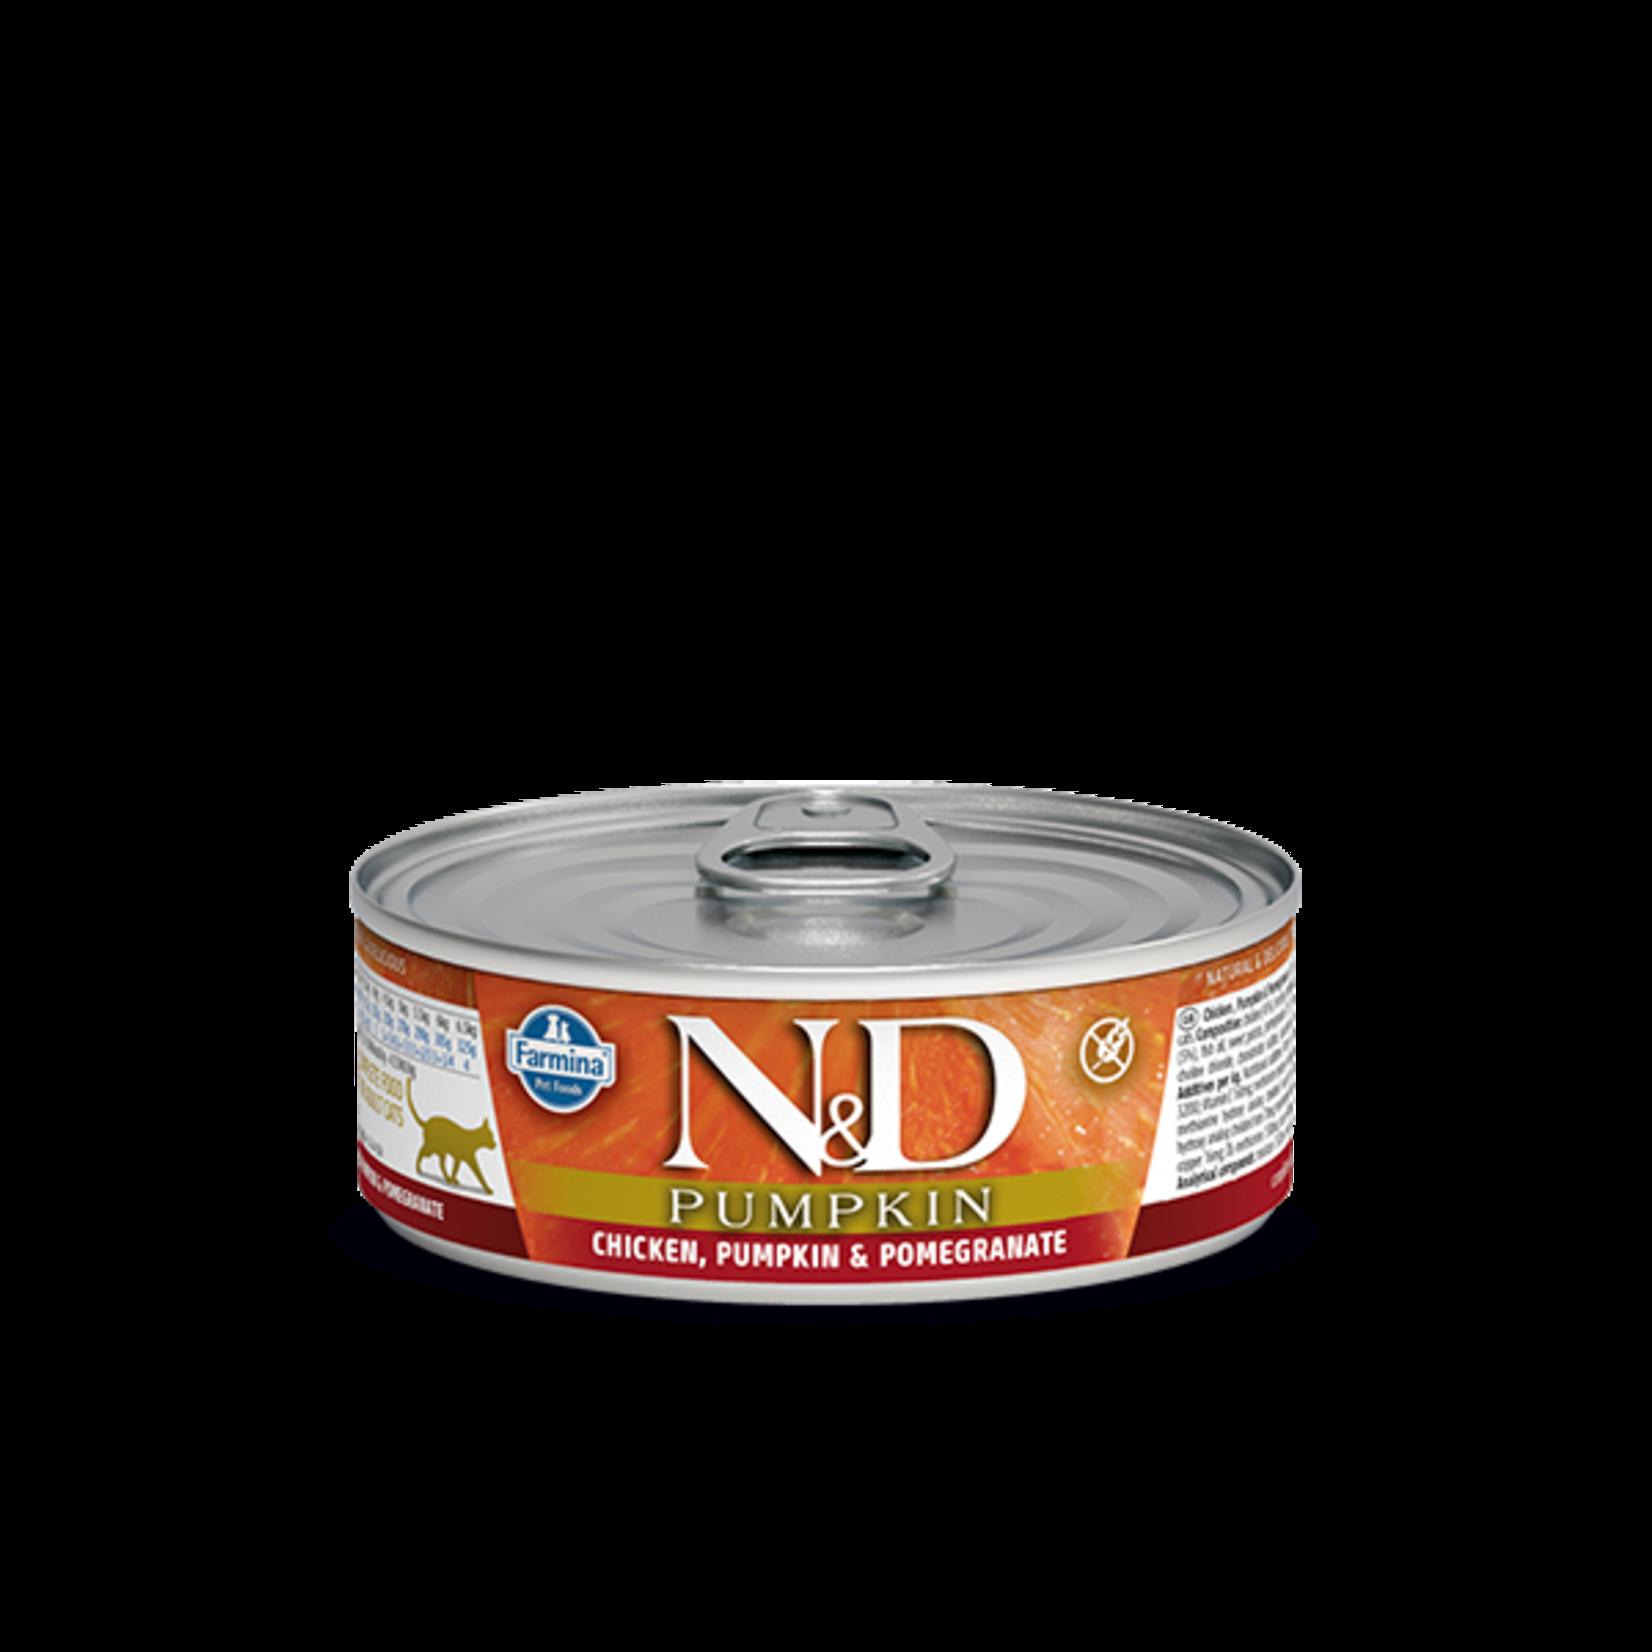 Farmina Farmina Pumpkin Chicken, Pomegranate Canned Cat Food 2.8oz